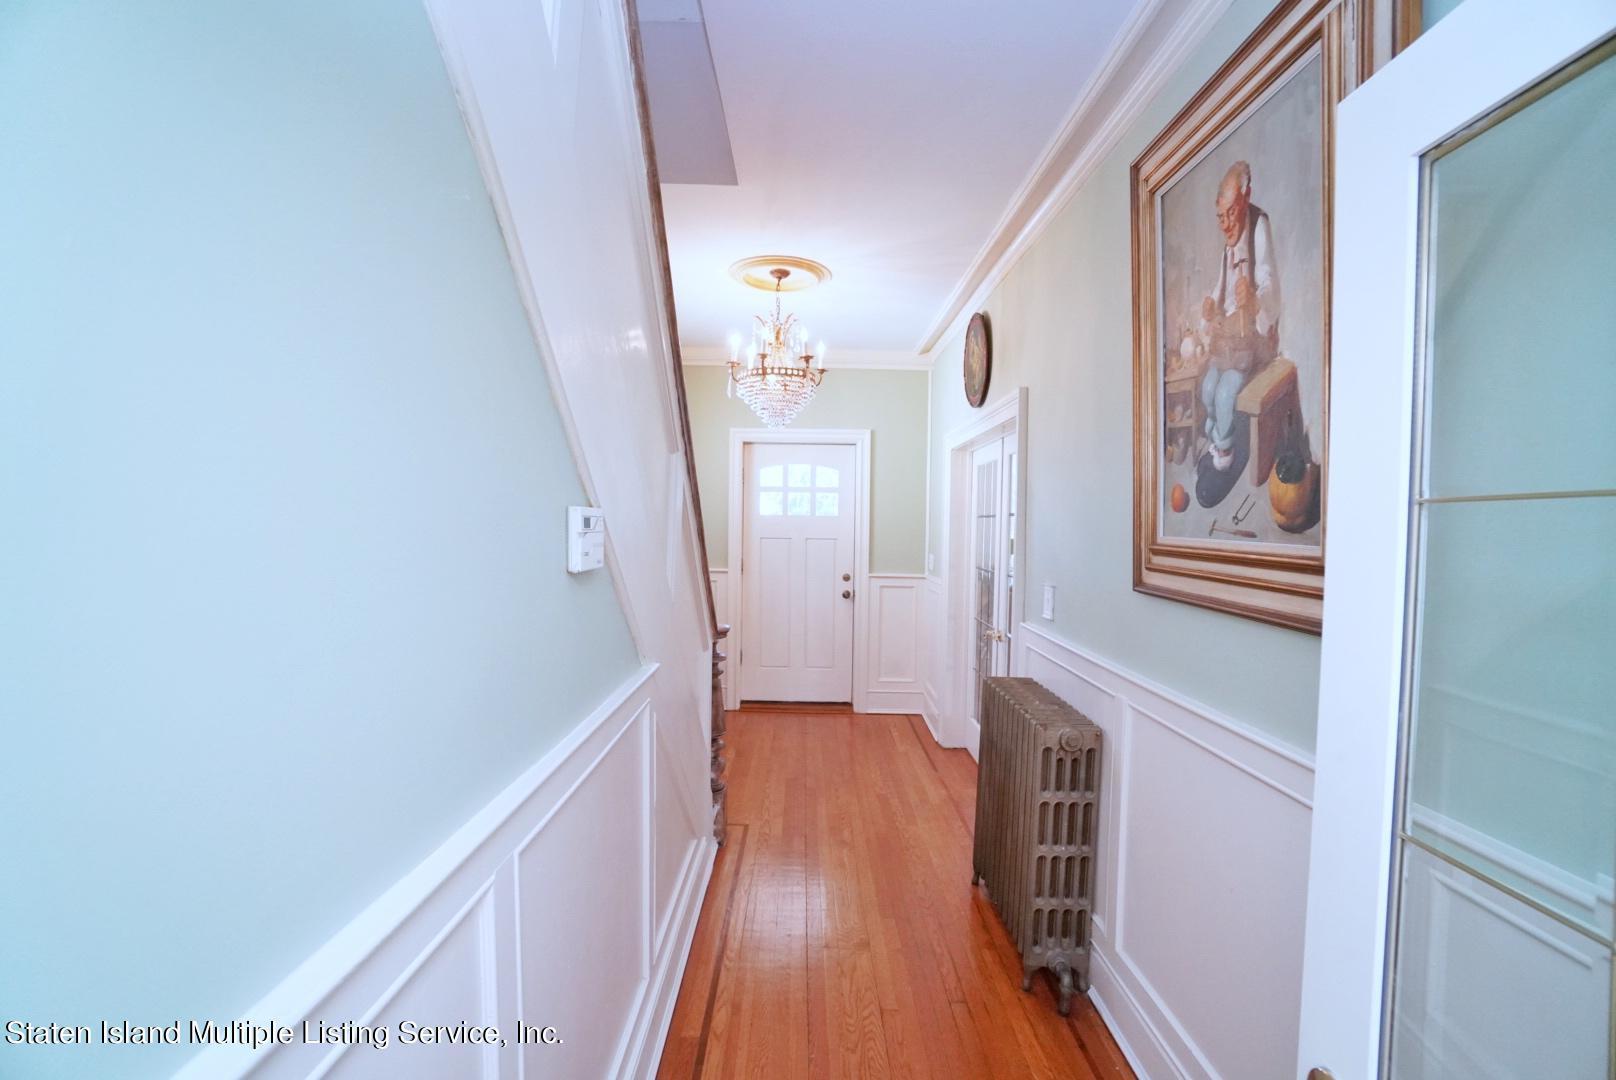 Single Family - Detached 264 Fisher Avenue  Staten Island, NY 10307, MLS-1146898-25